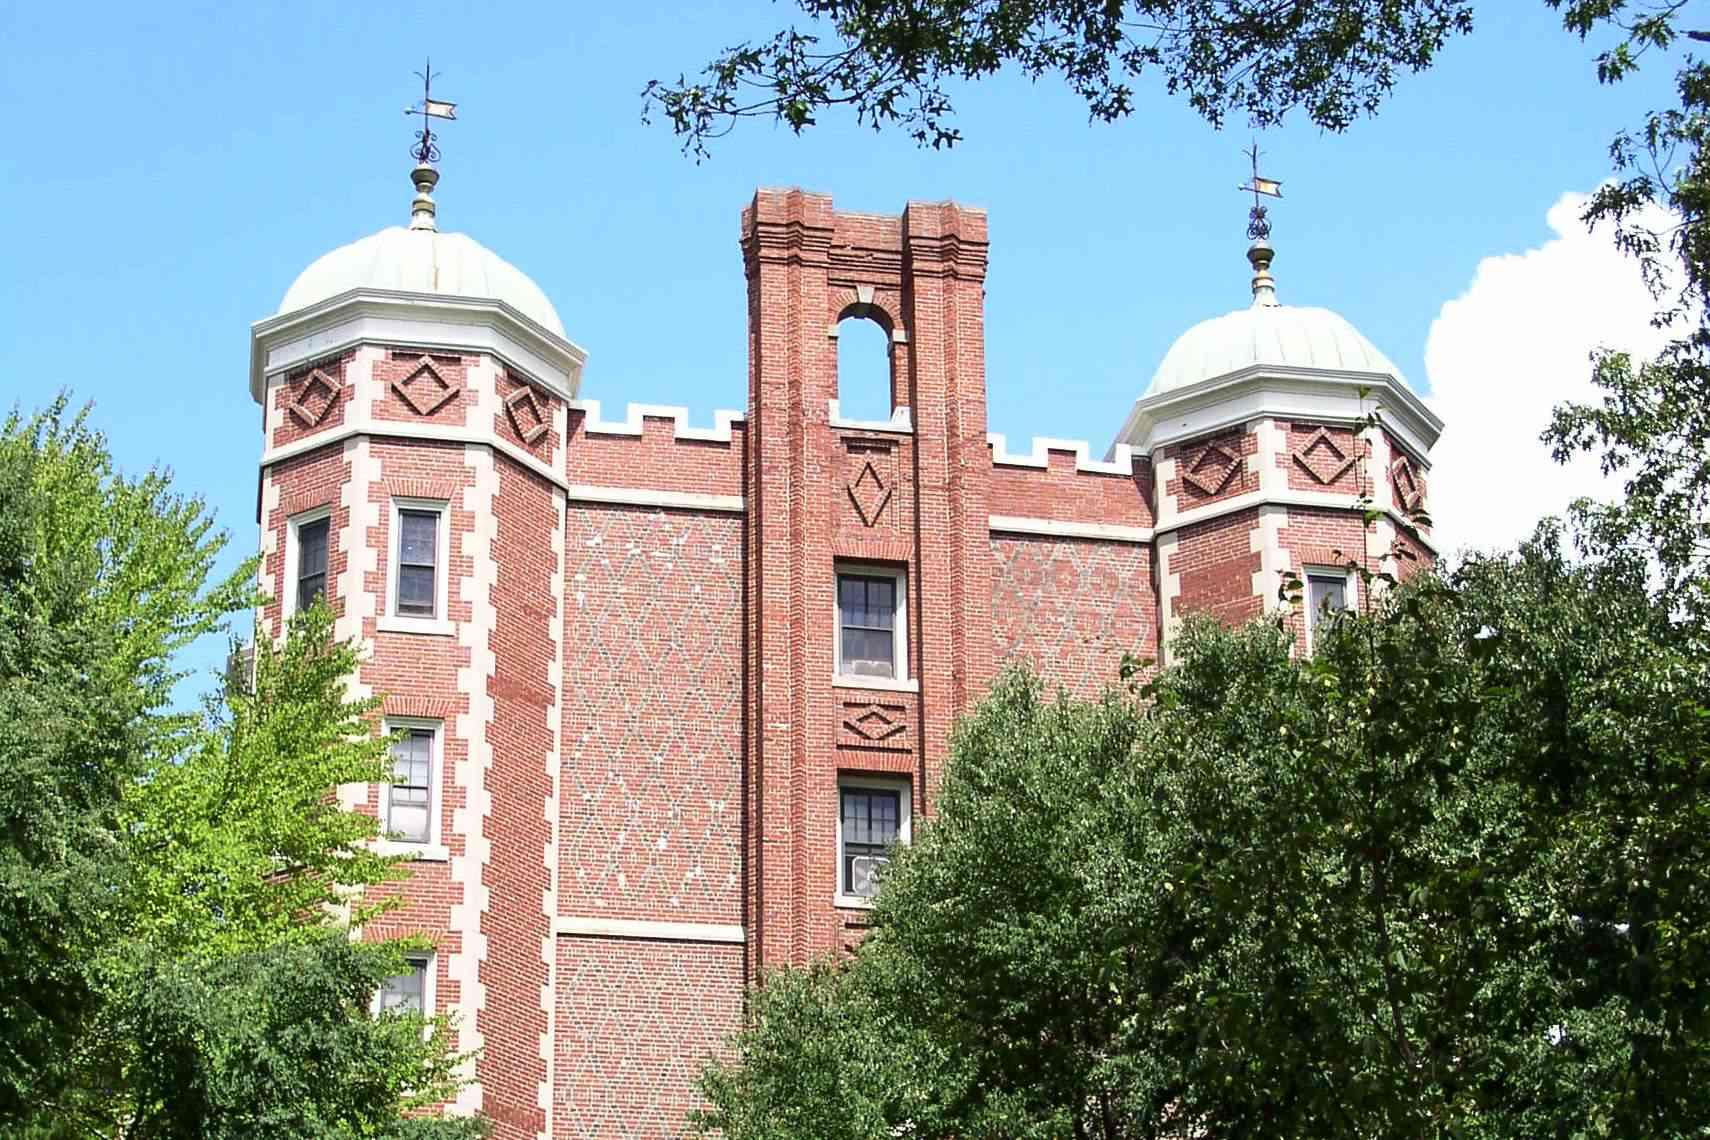 Bebe Hall at Wellseley College